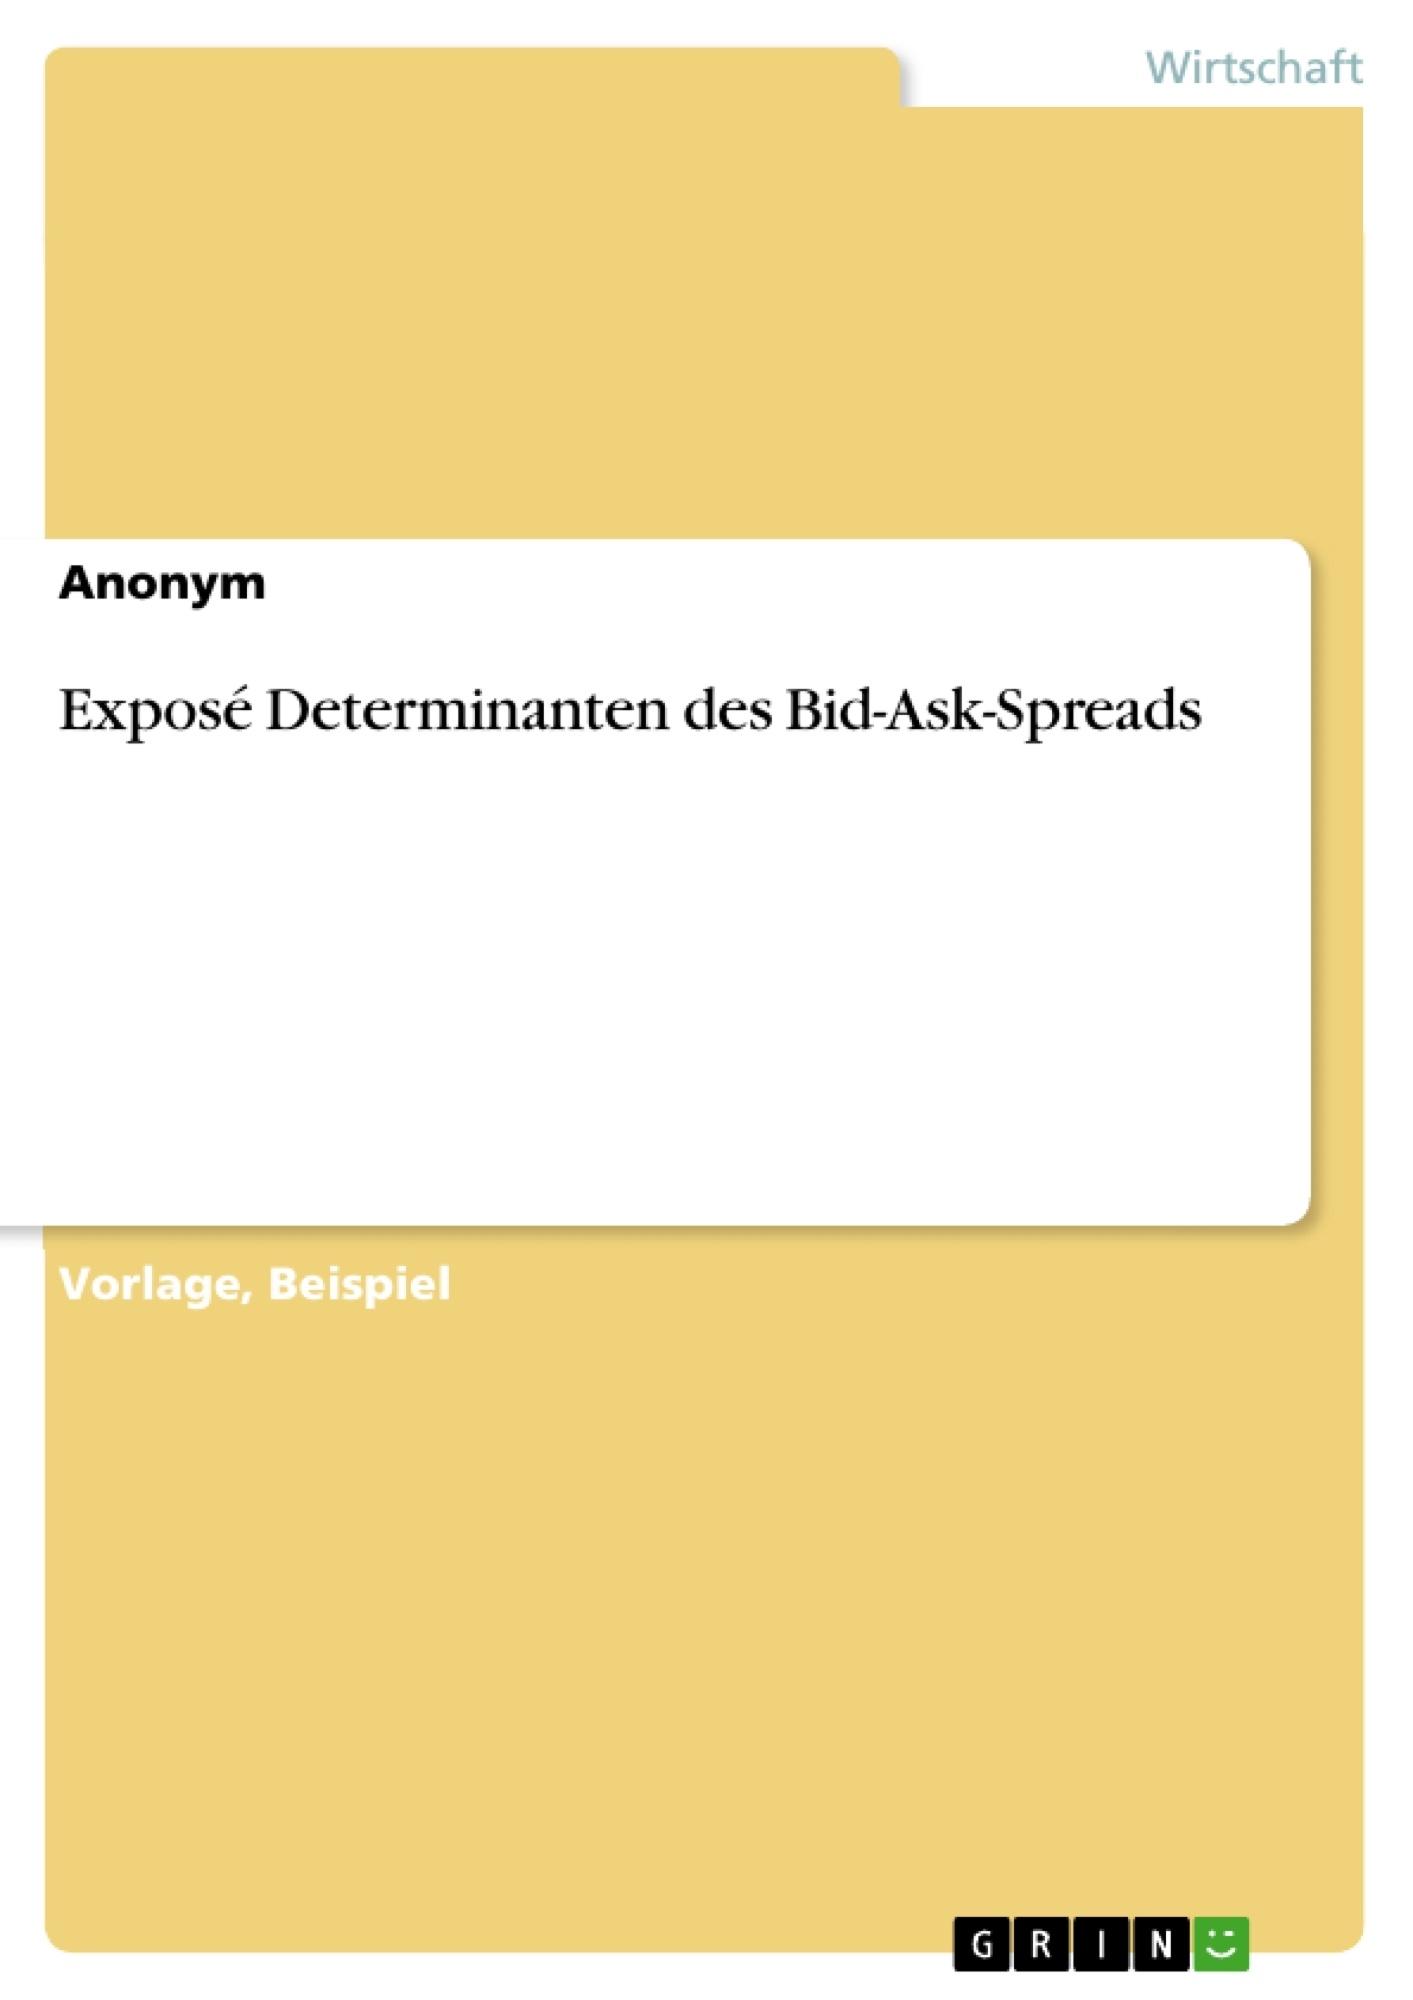 Titel: Exposé Determinanten des Bid-Ask-Spreads